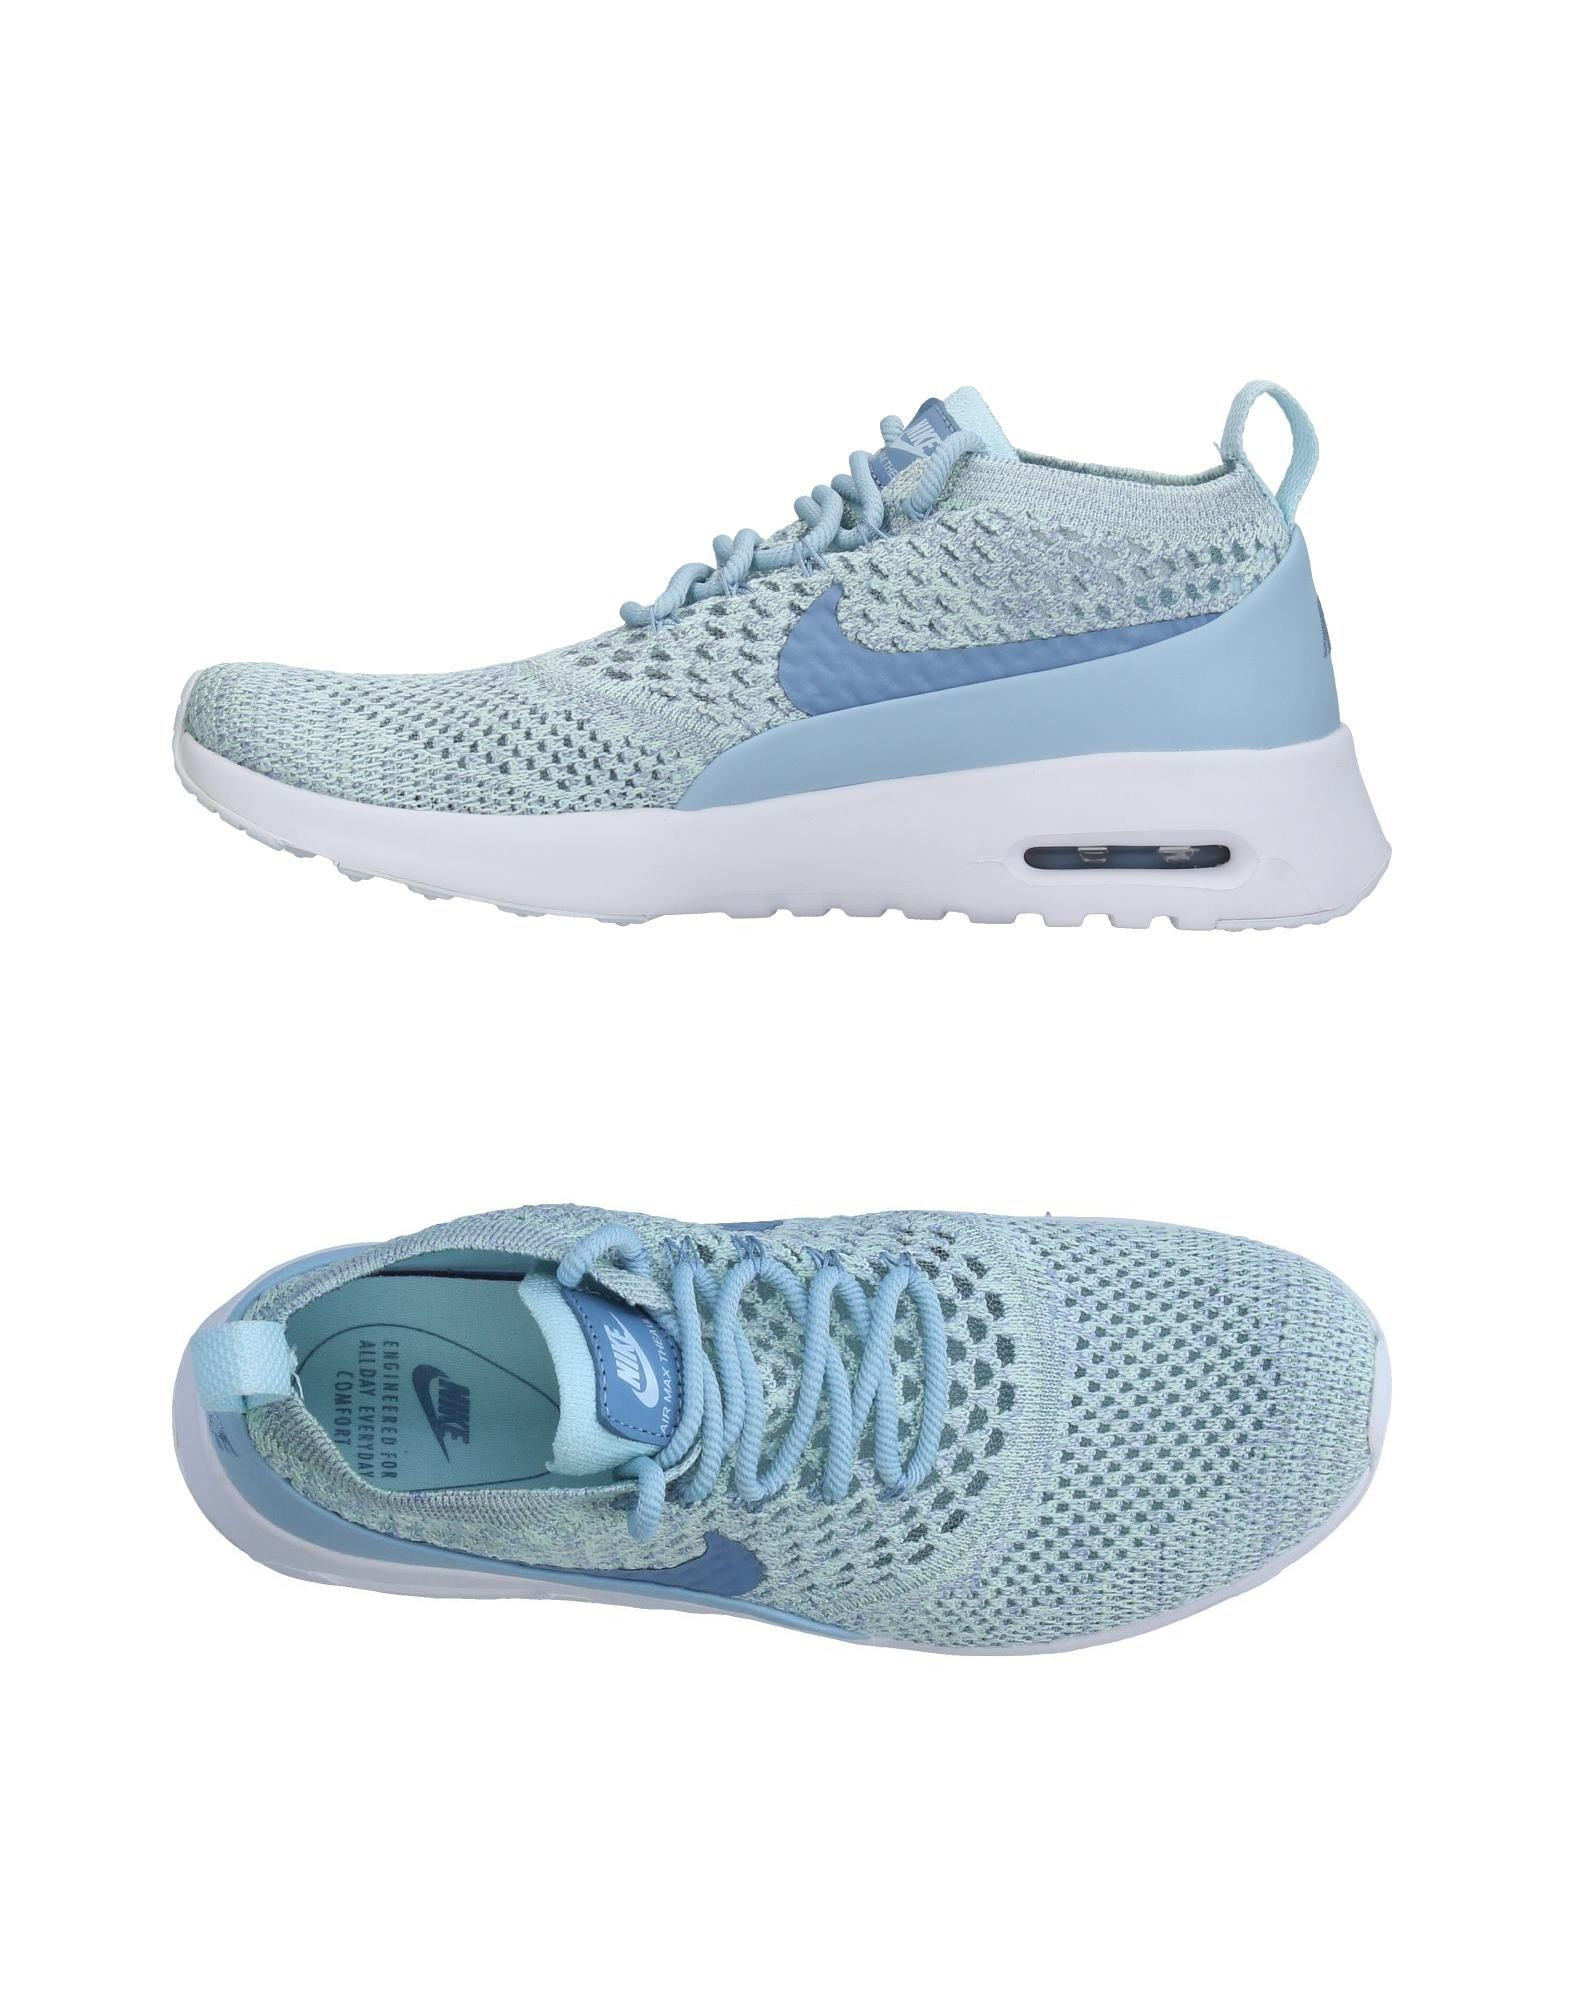 Nike Sneakers Damen Damen Sneakers  11328311DO  06f843